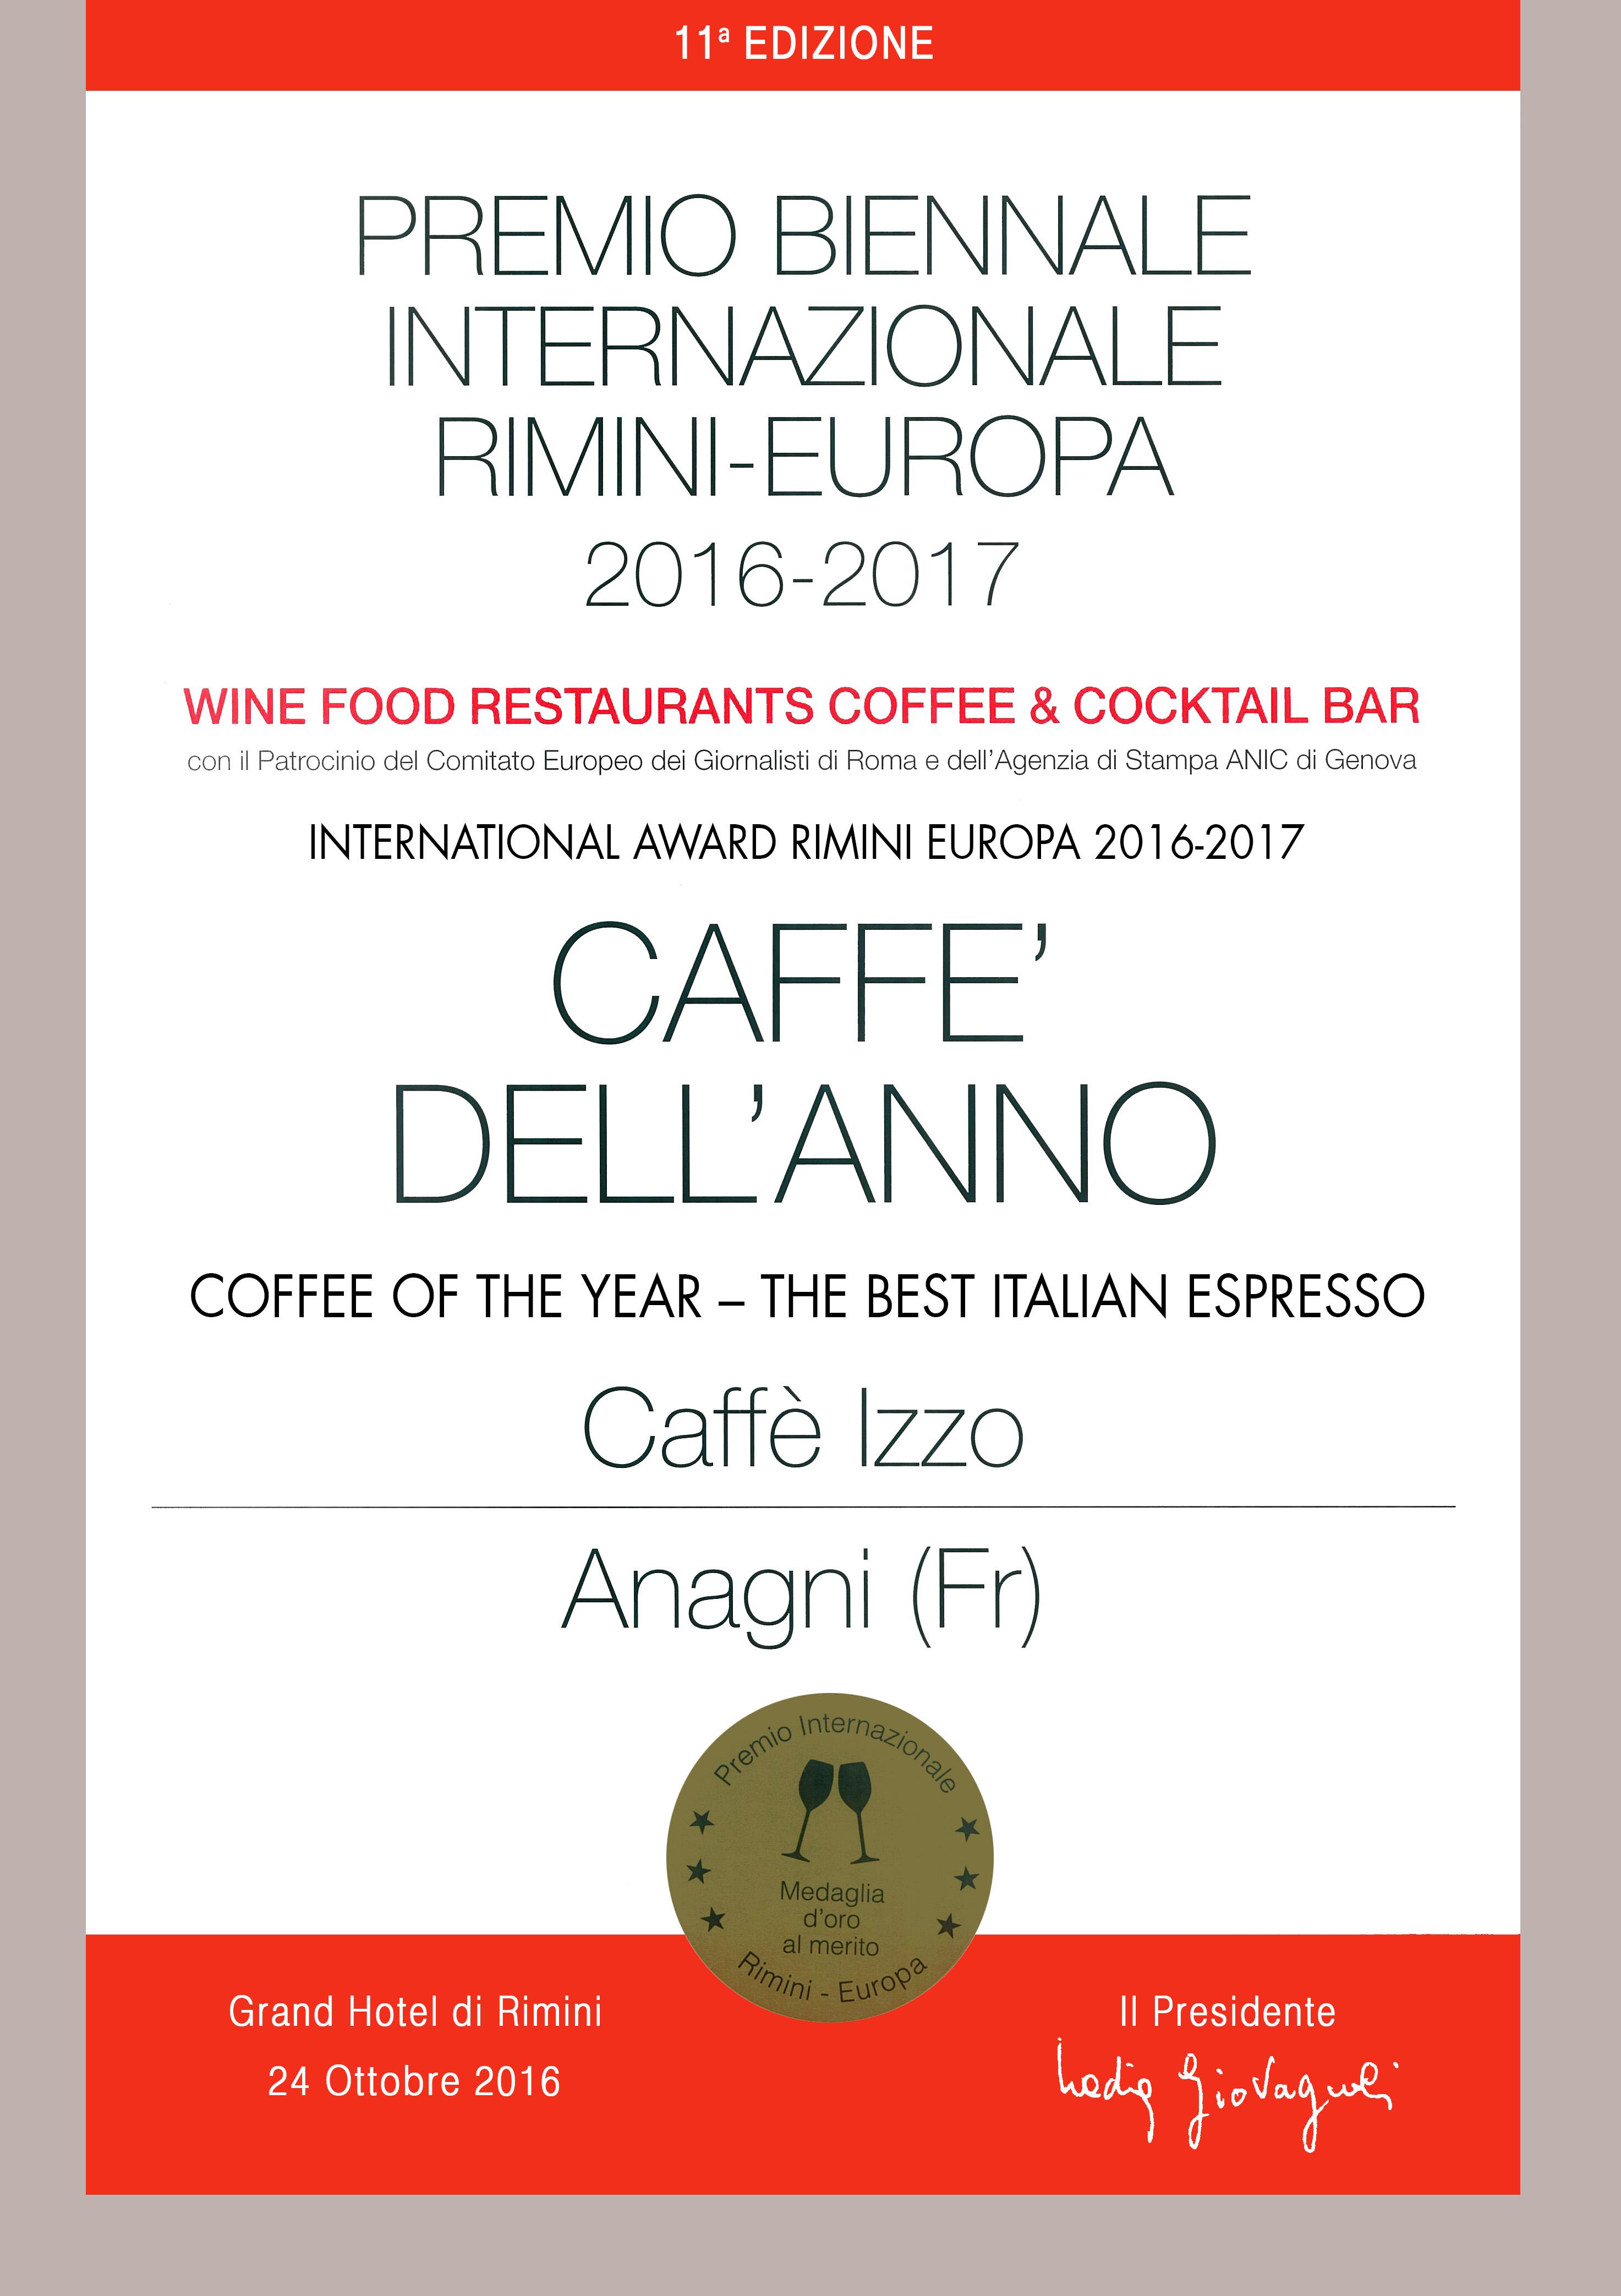 Izzo Kaffee gewinnt auf dem International Award in Rimini